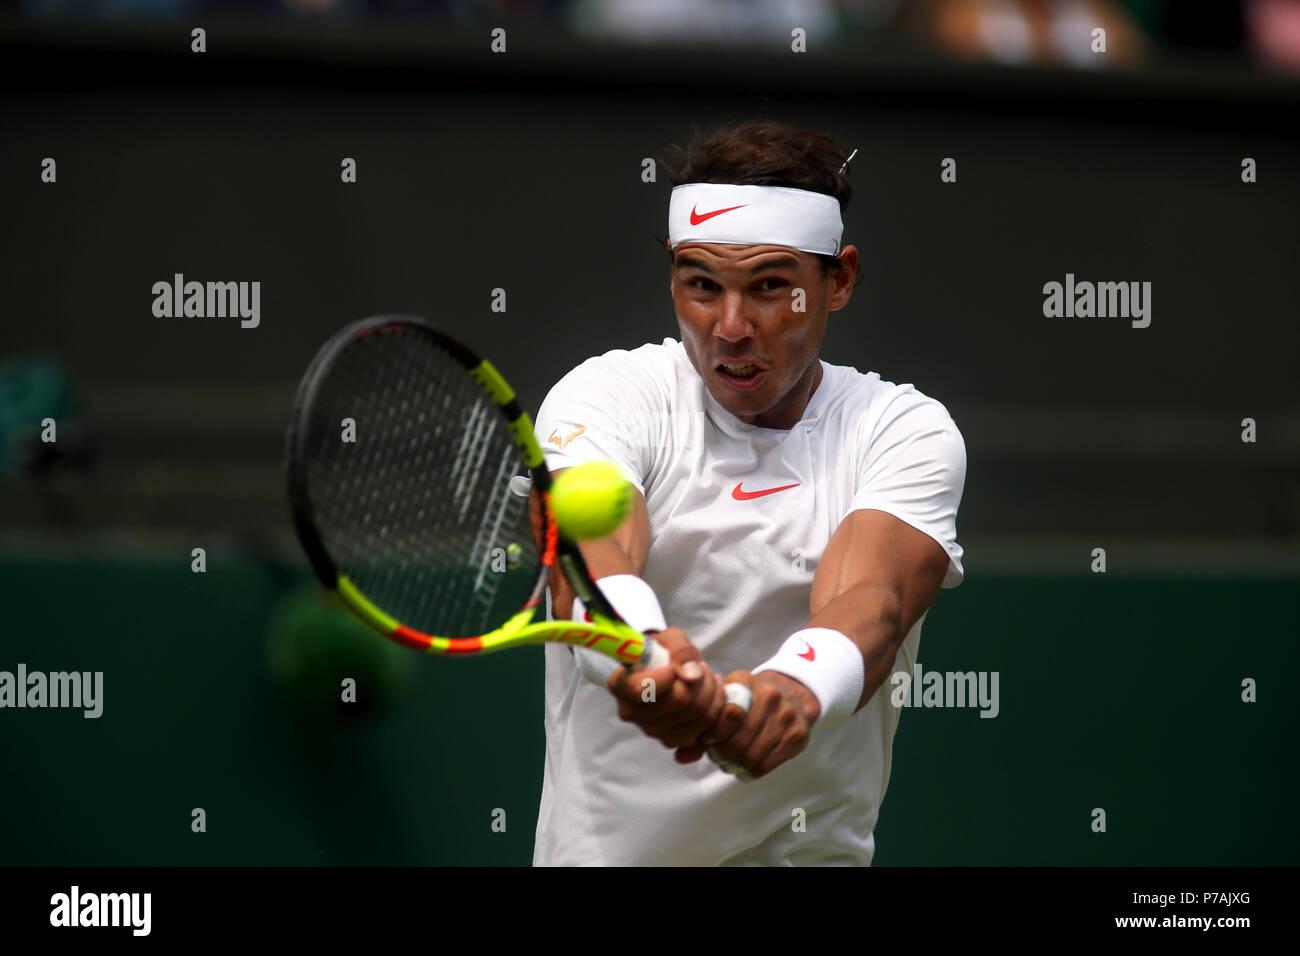 new arrival c7db1 0f7e5 Wimbledon Tennis  Rafael Nadal of Spain